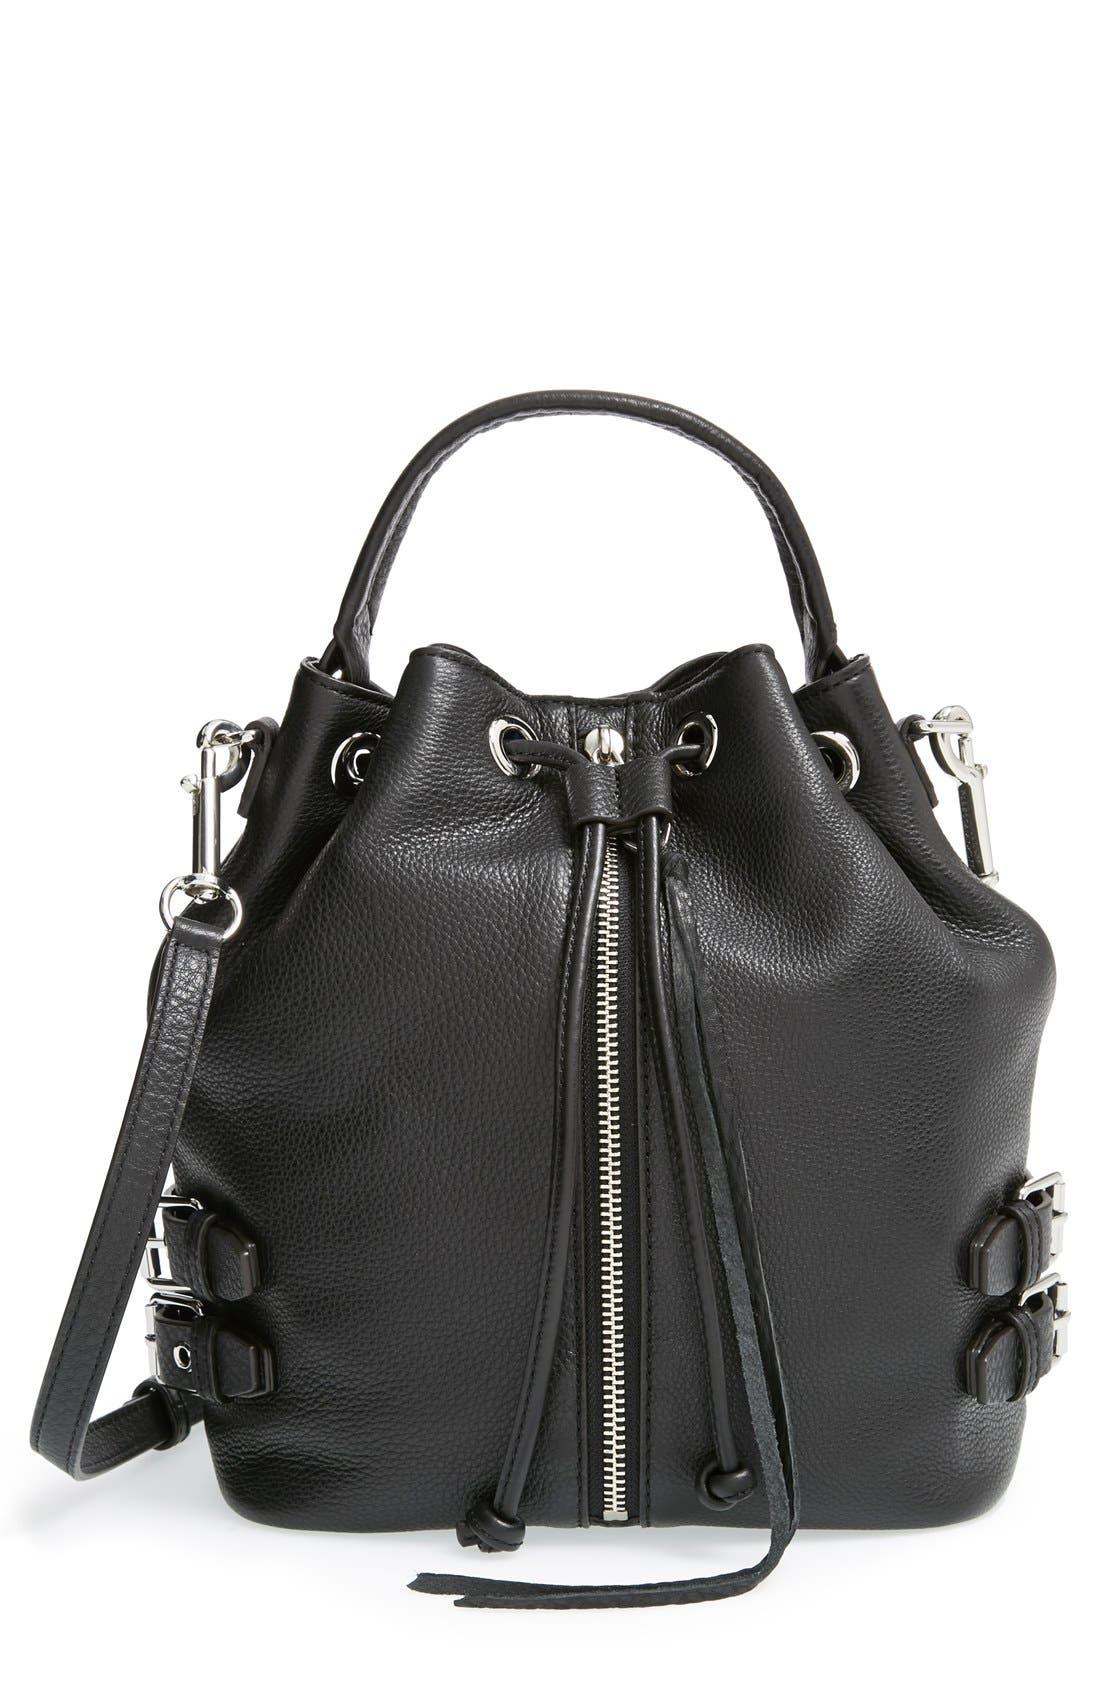 REBECCA MINKOFF 'Moto' Bucket Bag, Main, color, 001